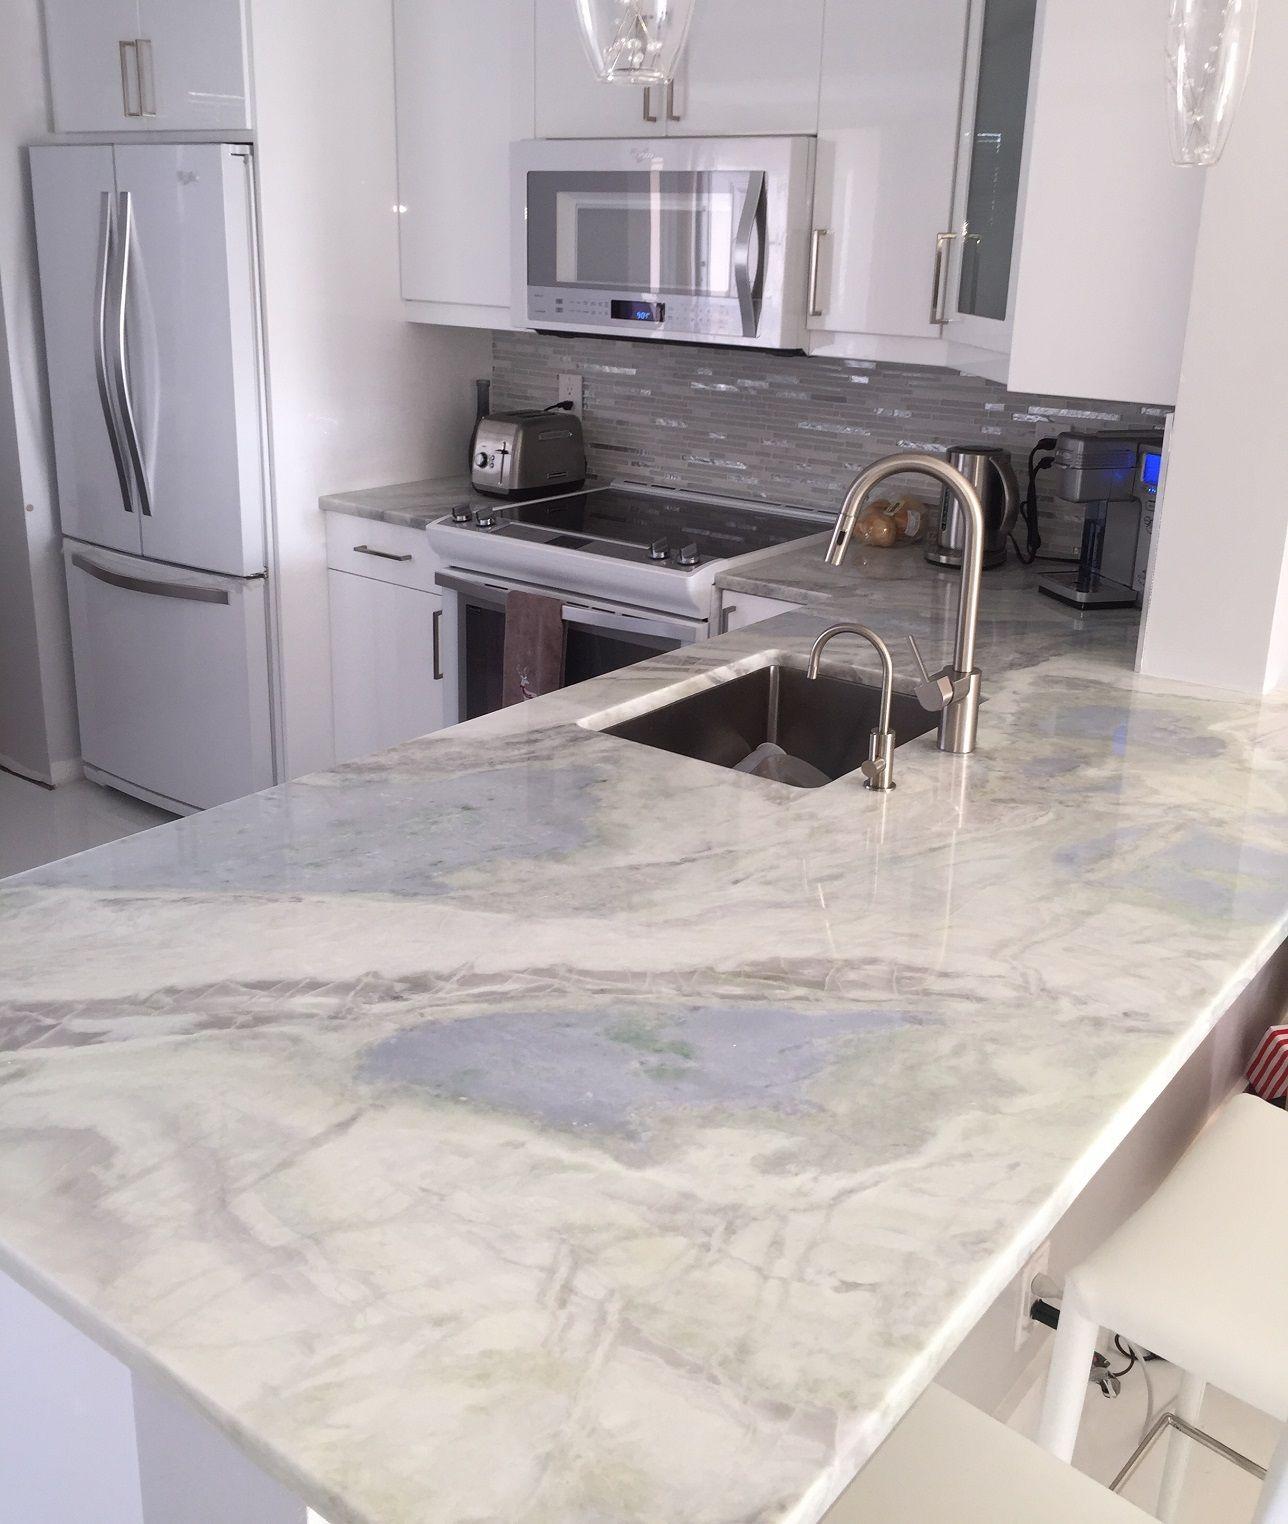 lumen quartzite countertops kitchen in hallandale beach | kitchen